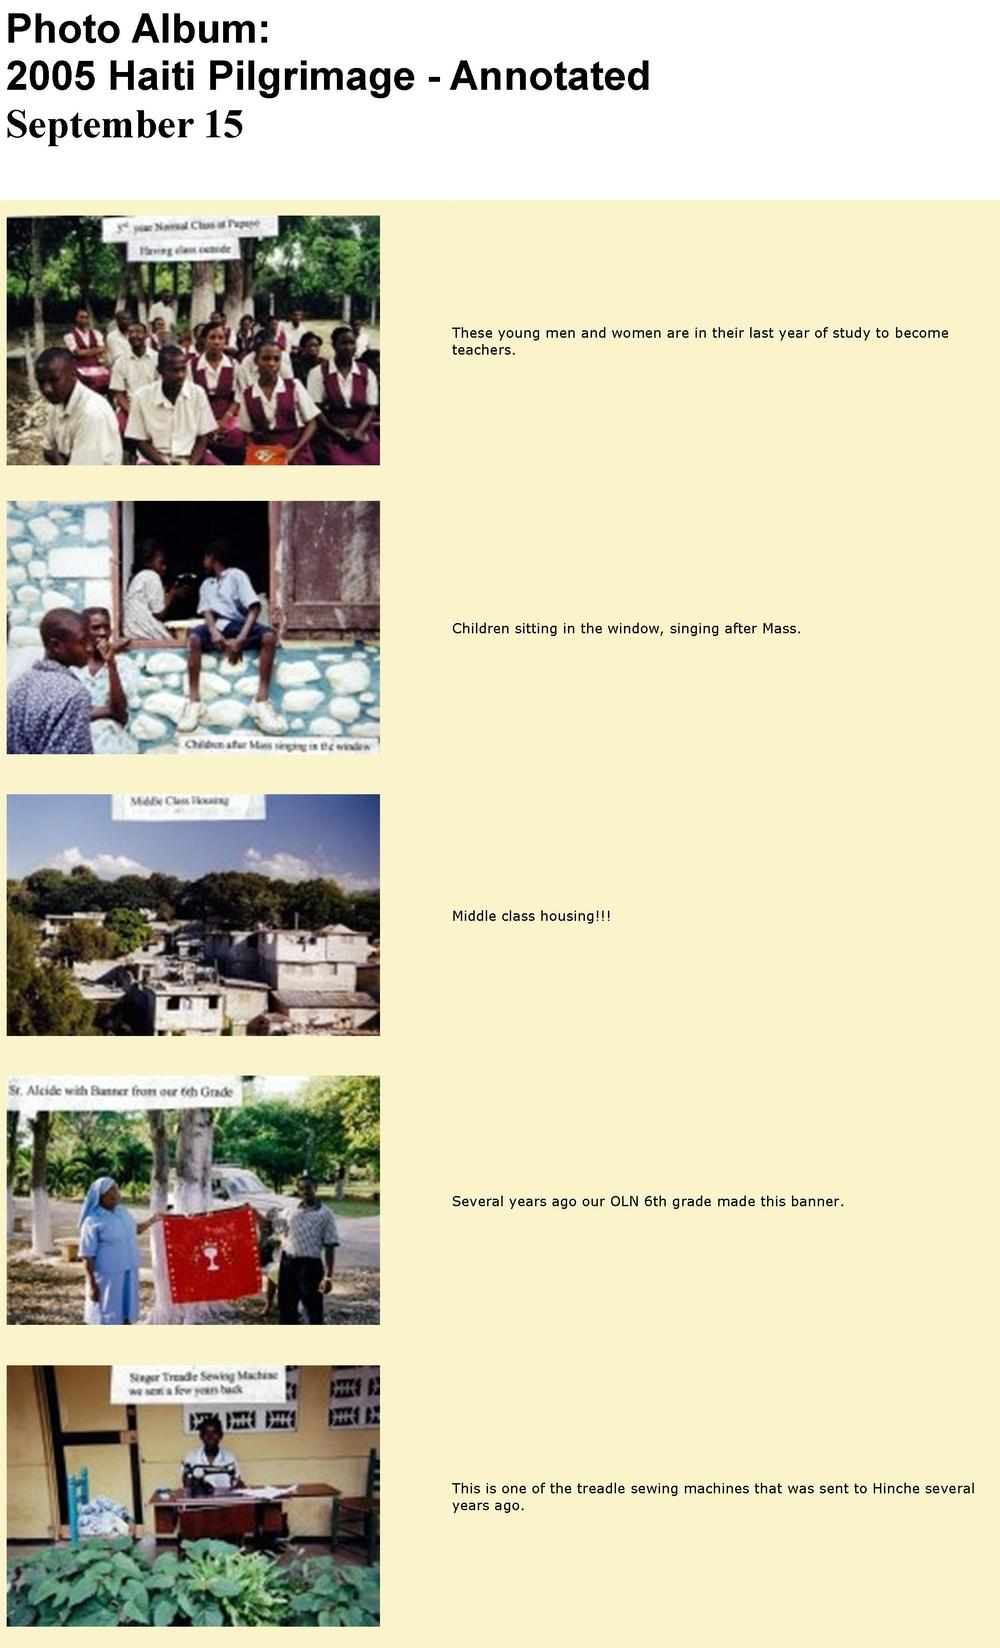 2005 Annotated Photo Album.jpg